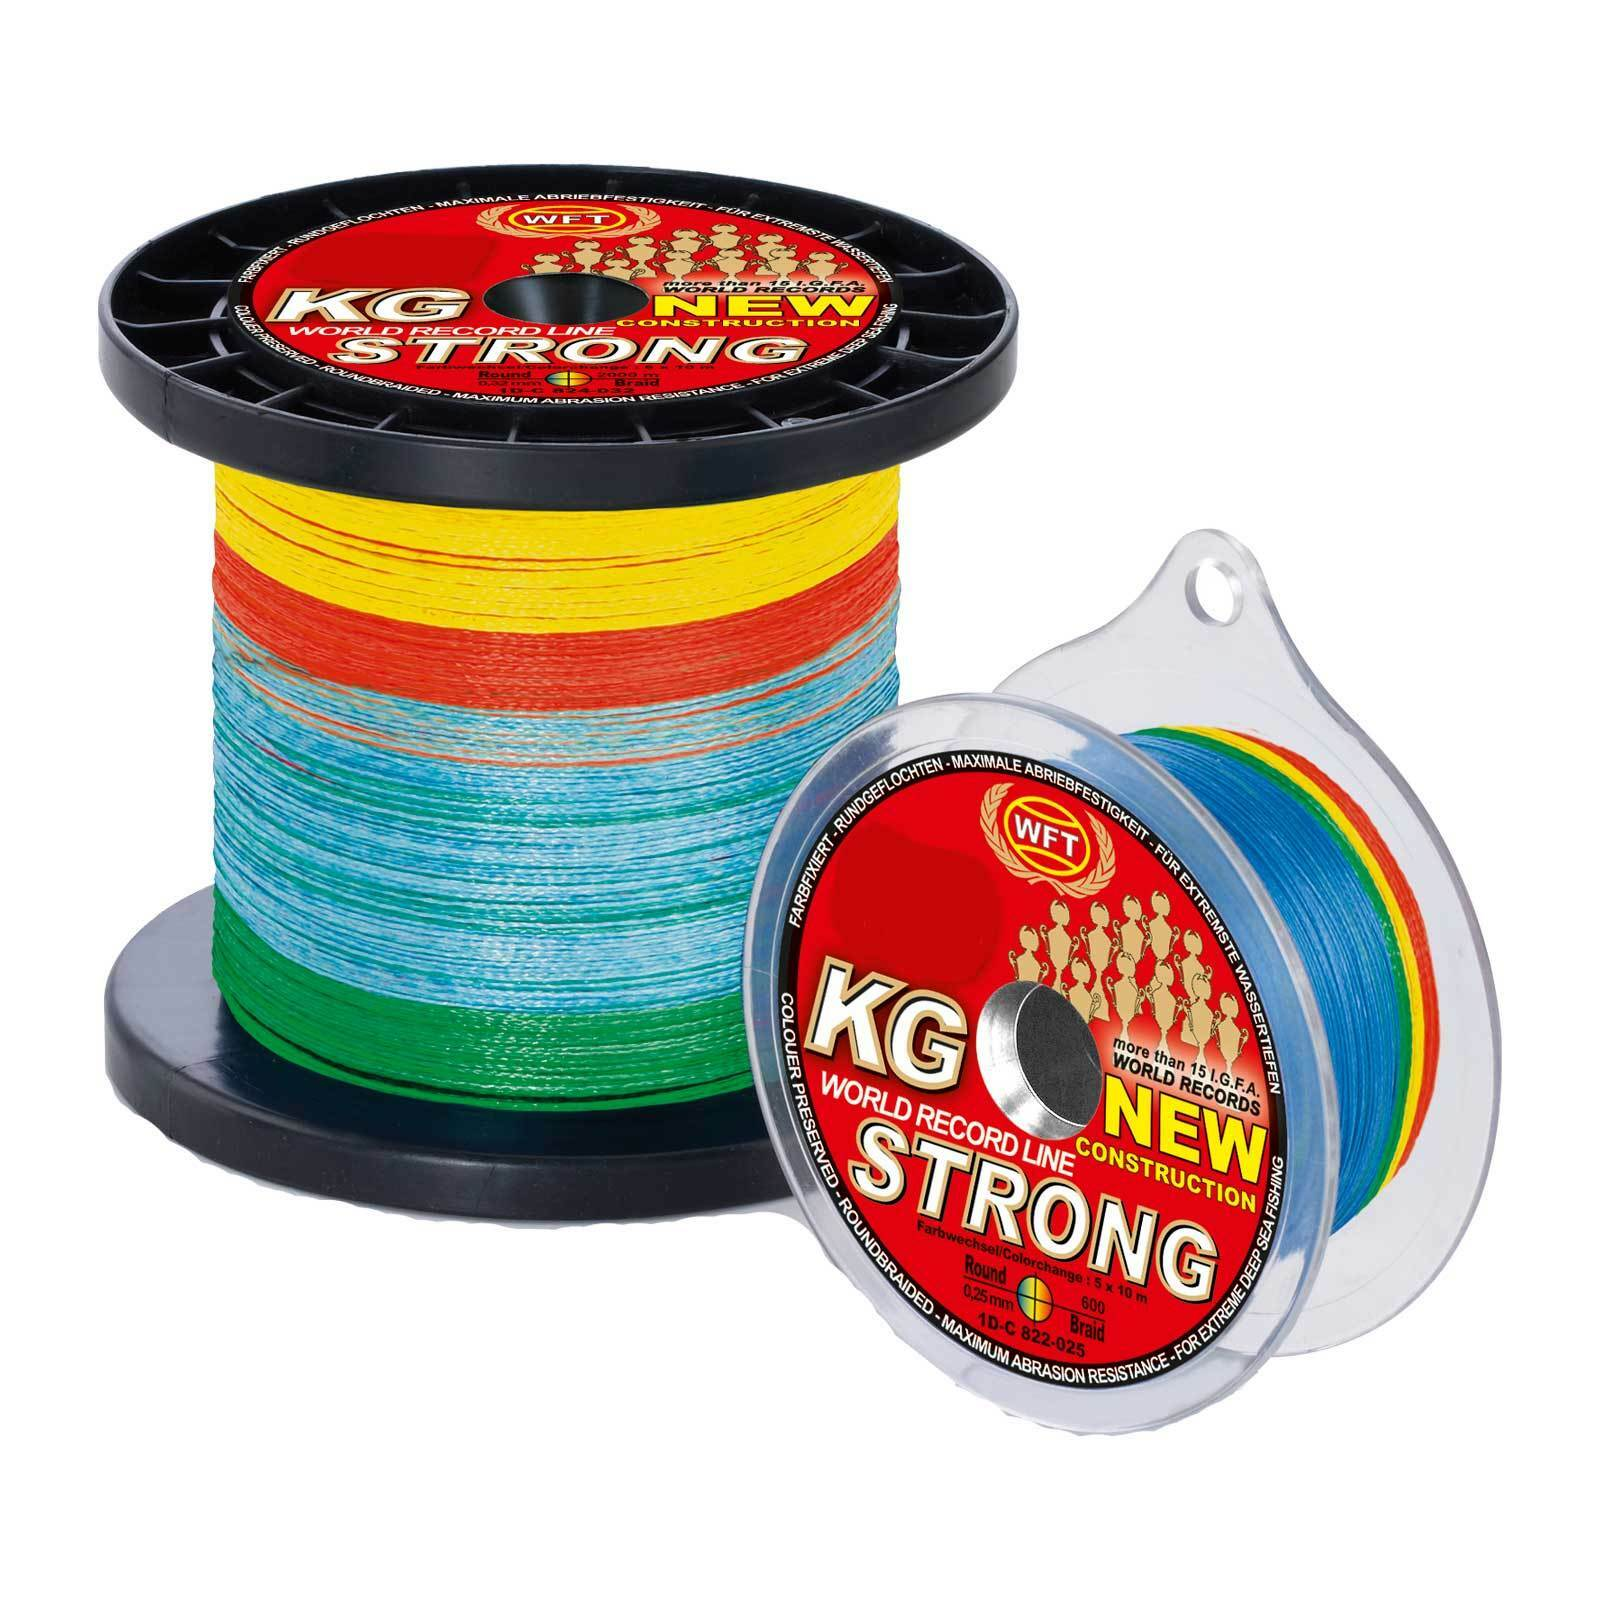 (0,21EUR M) Wft Geflocht. Spago - kg Strong Esatto 39Kg 0,25 360m Multicolor